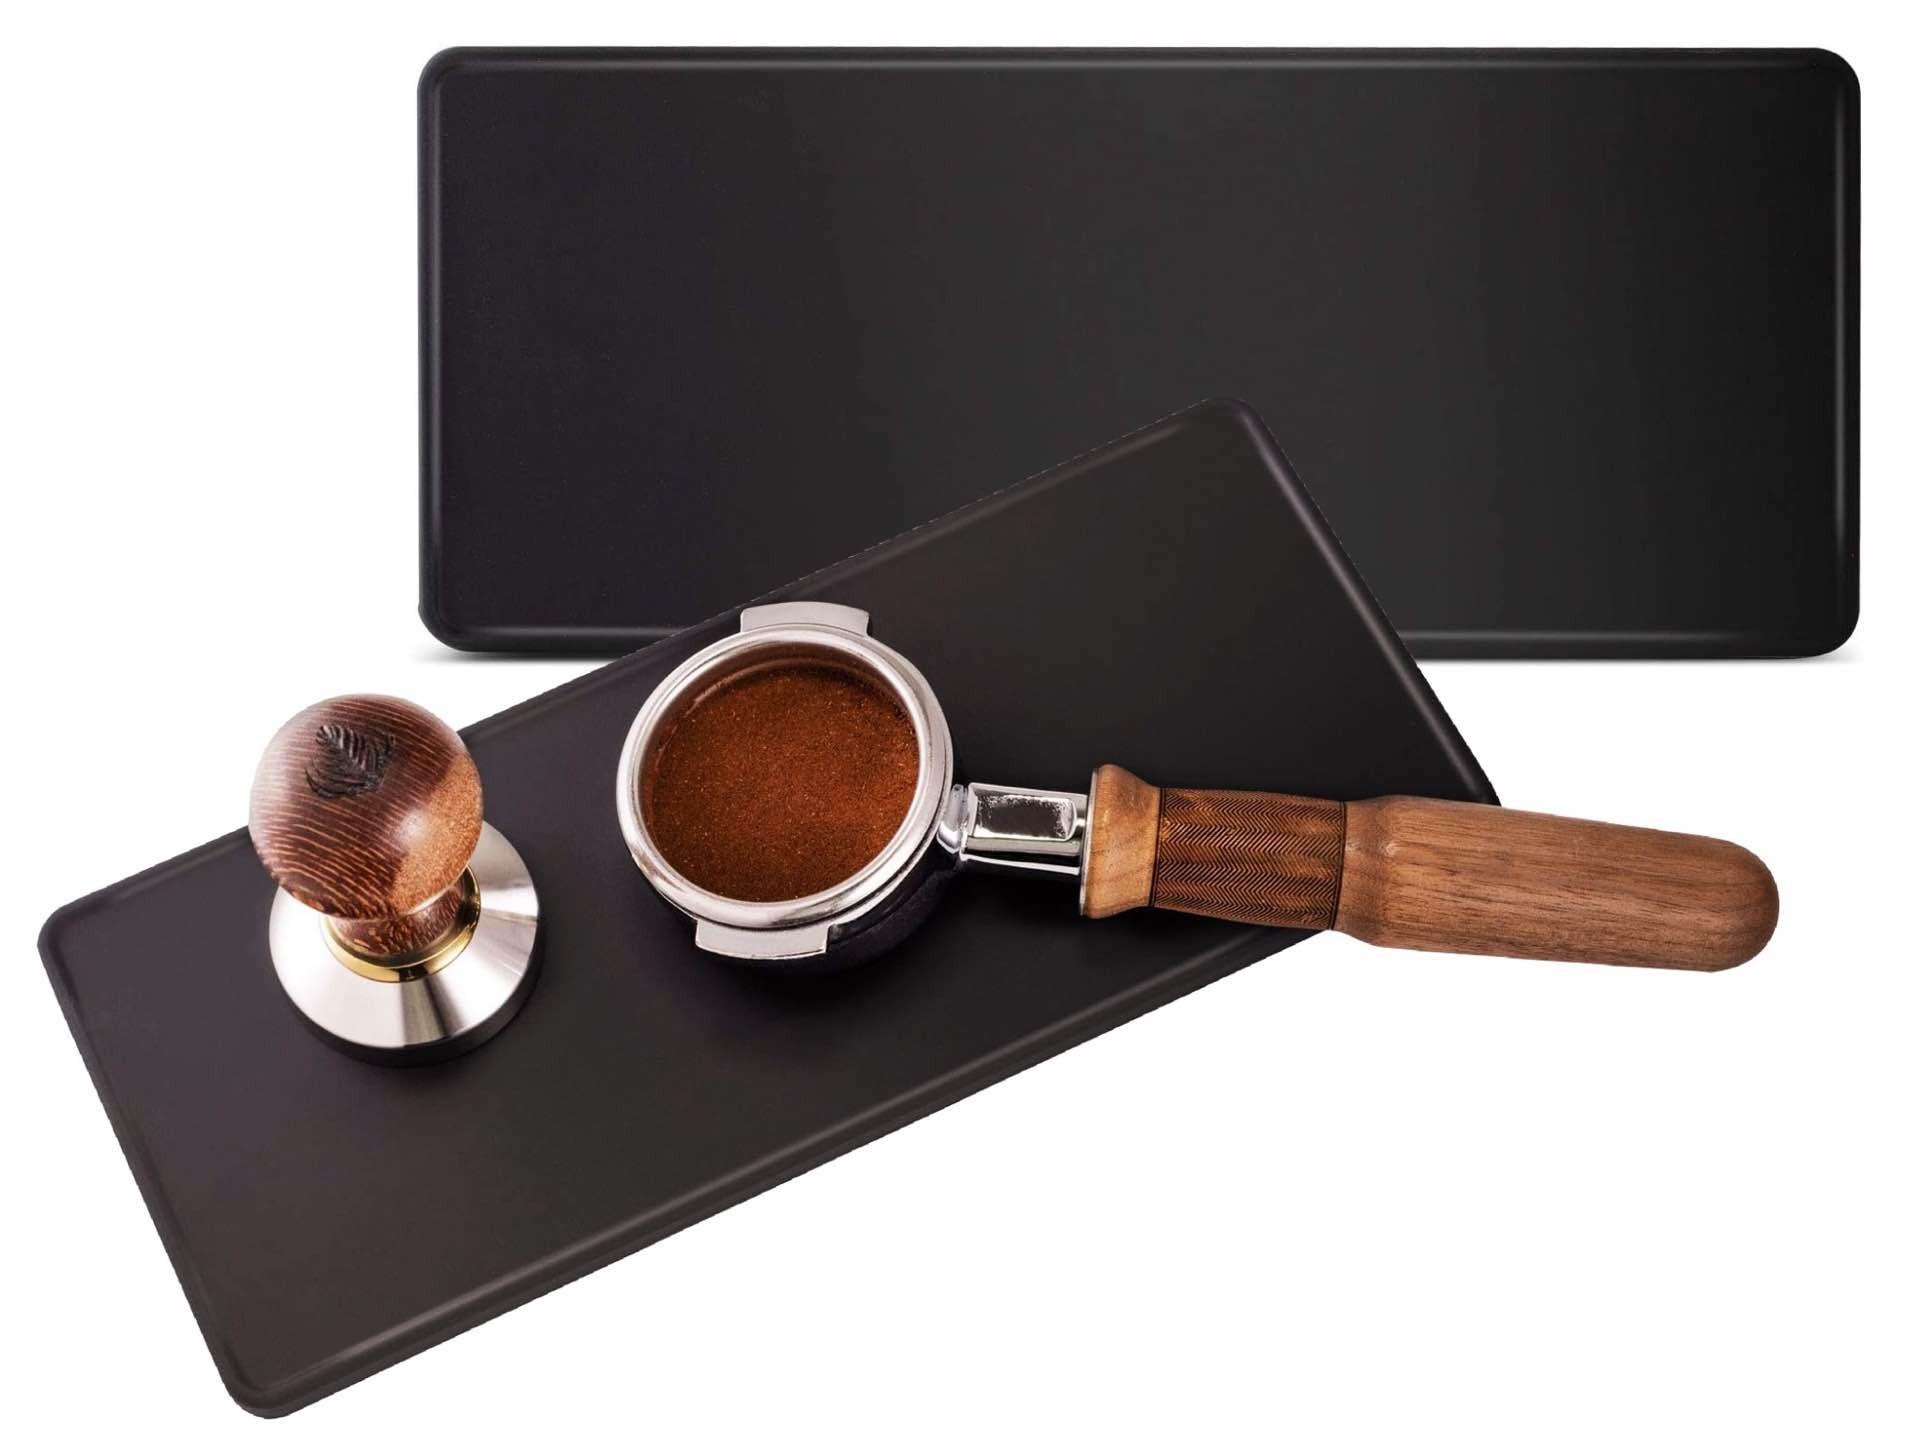 barista-basics-espresso-portafilter-tamping-mat